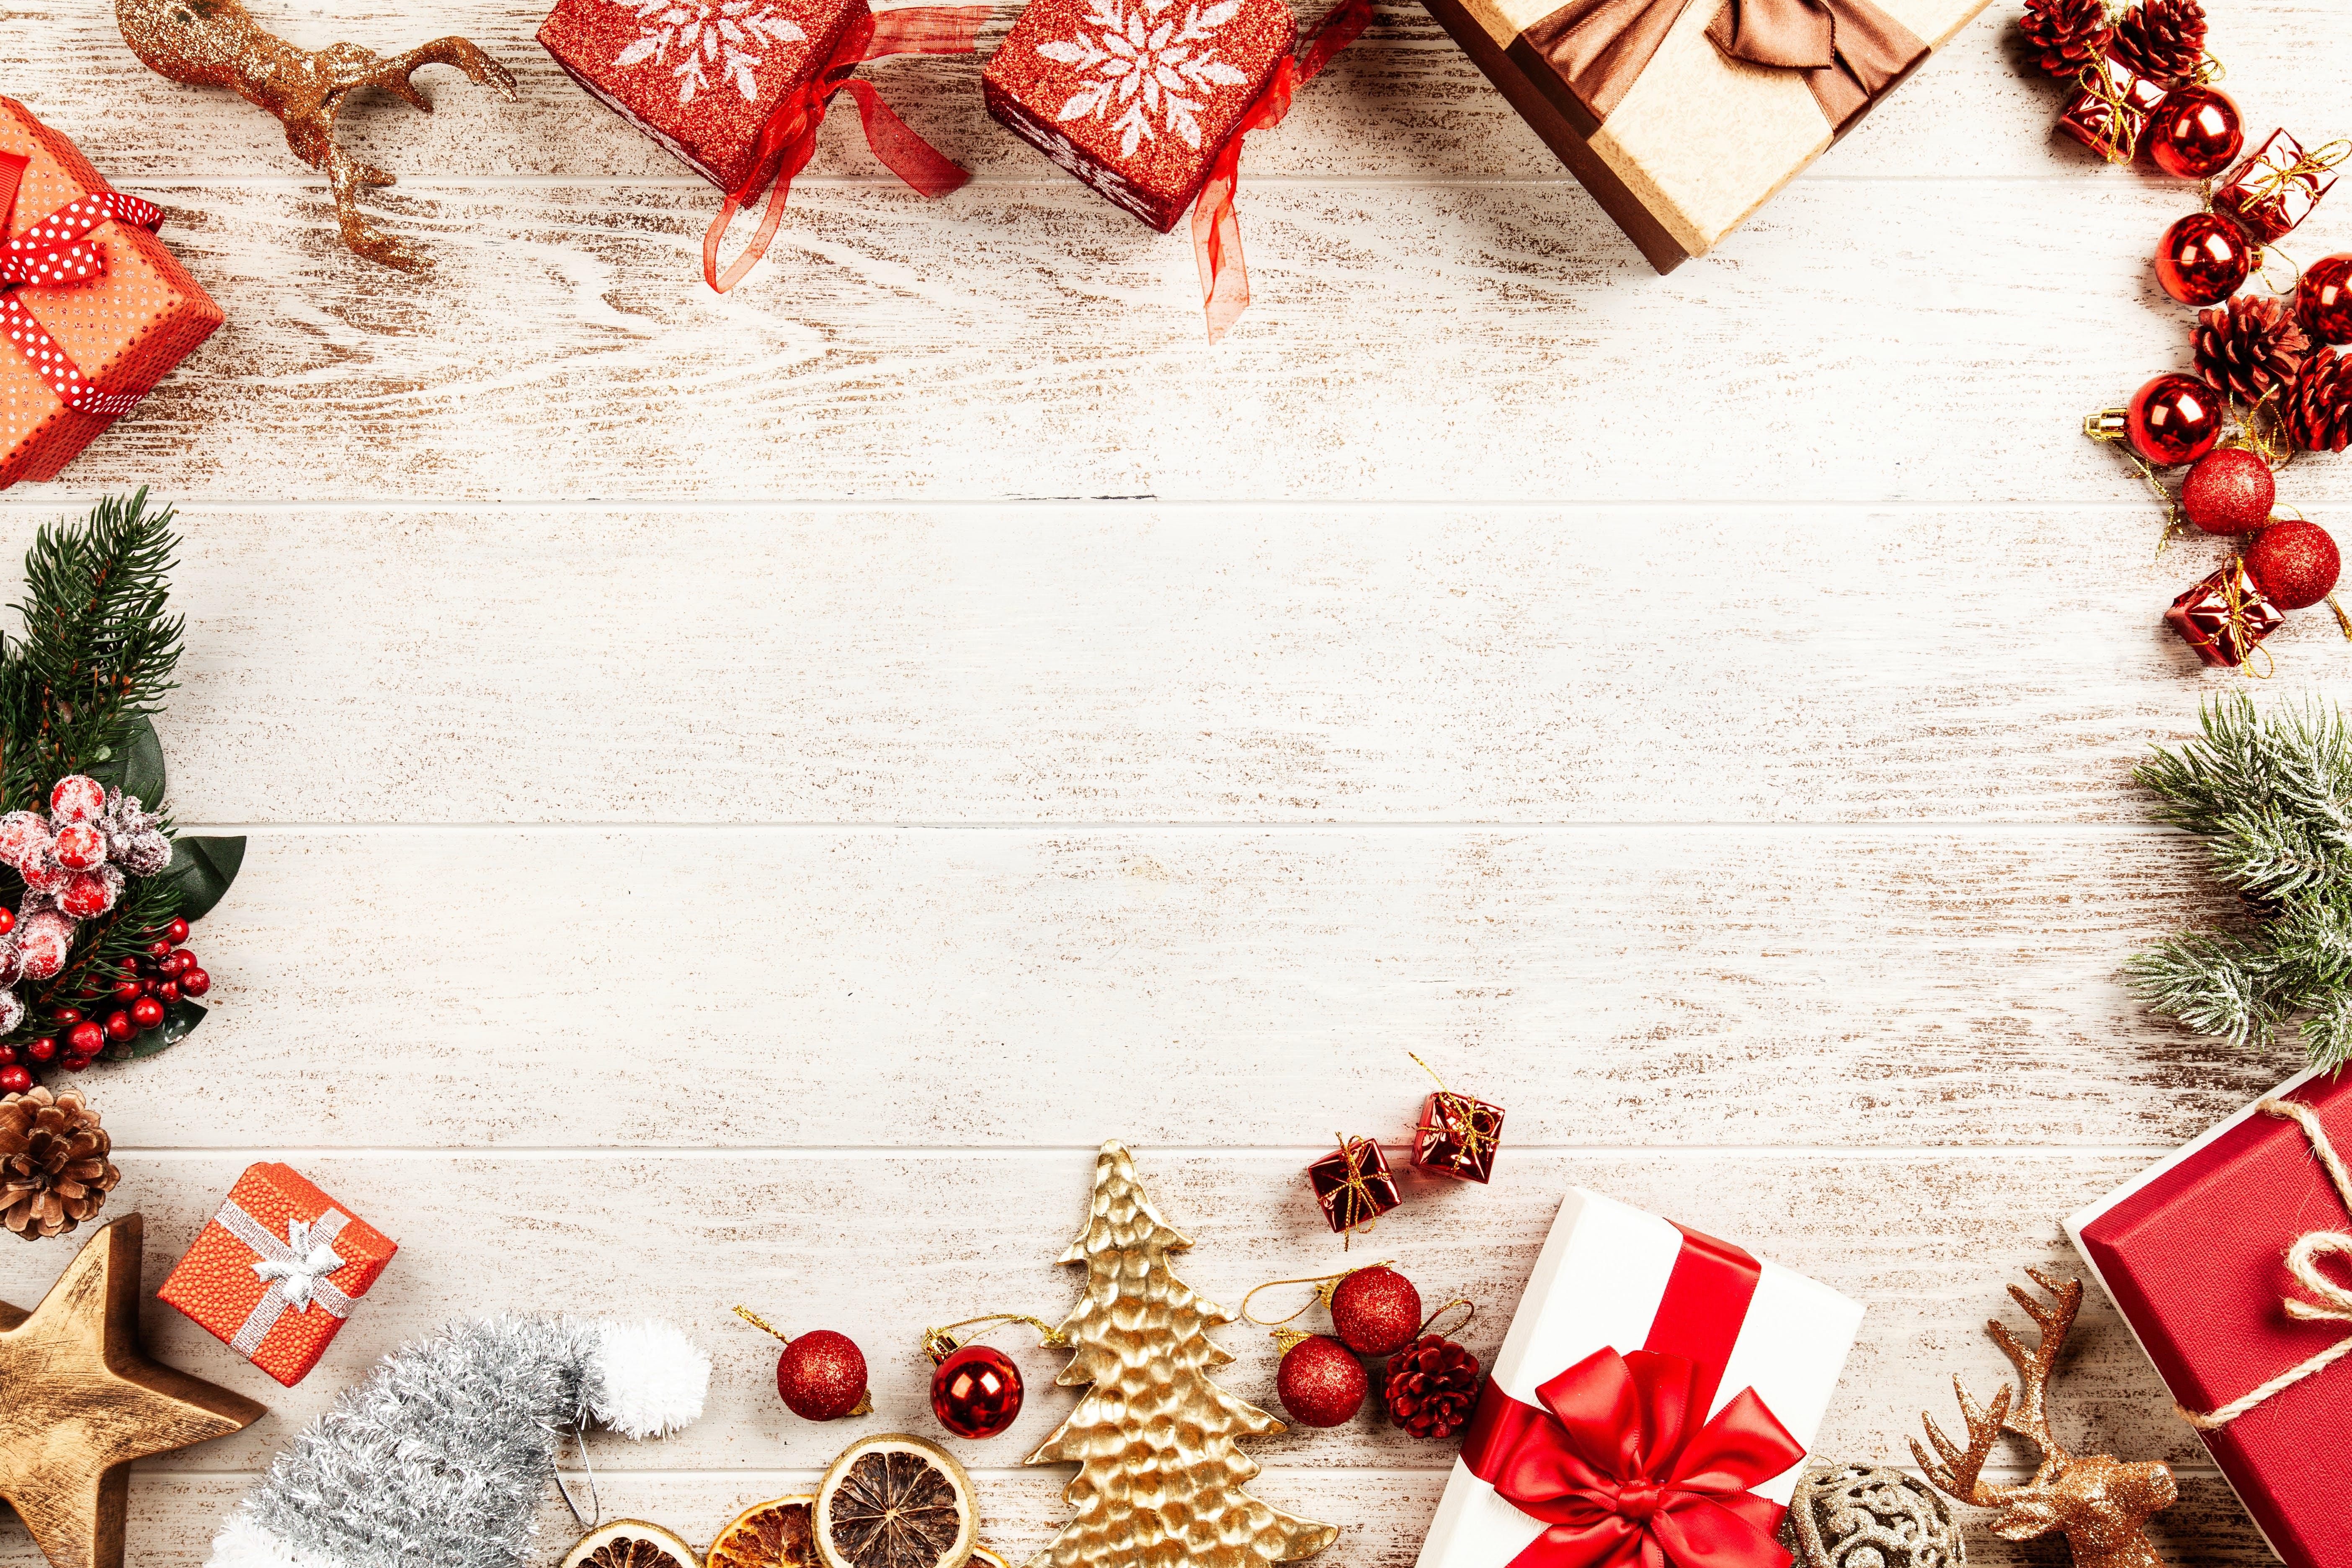 Christmas Board Decors